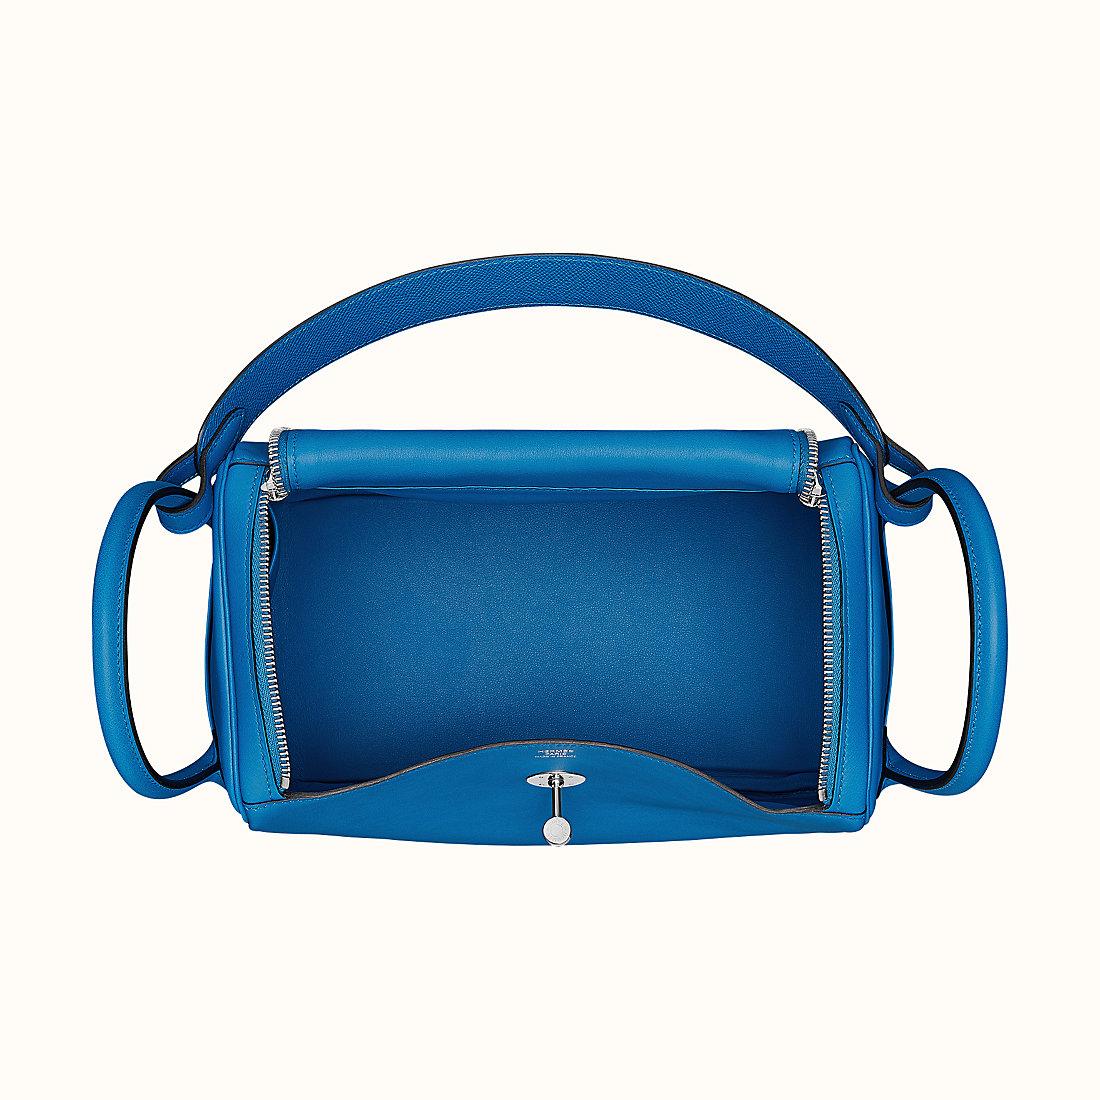 Hong Kong Hermes Lindy 30 Bleu Zellige/Bleu Encre/Rouge Swift Epsom